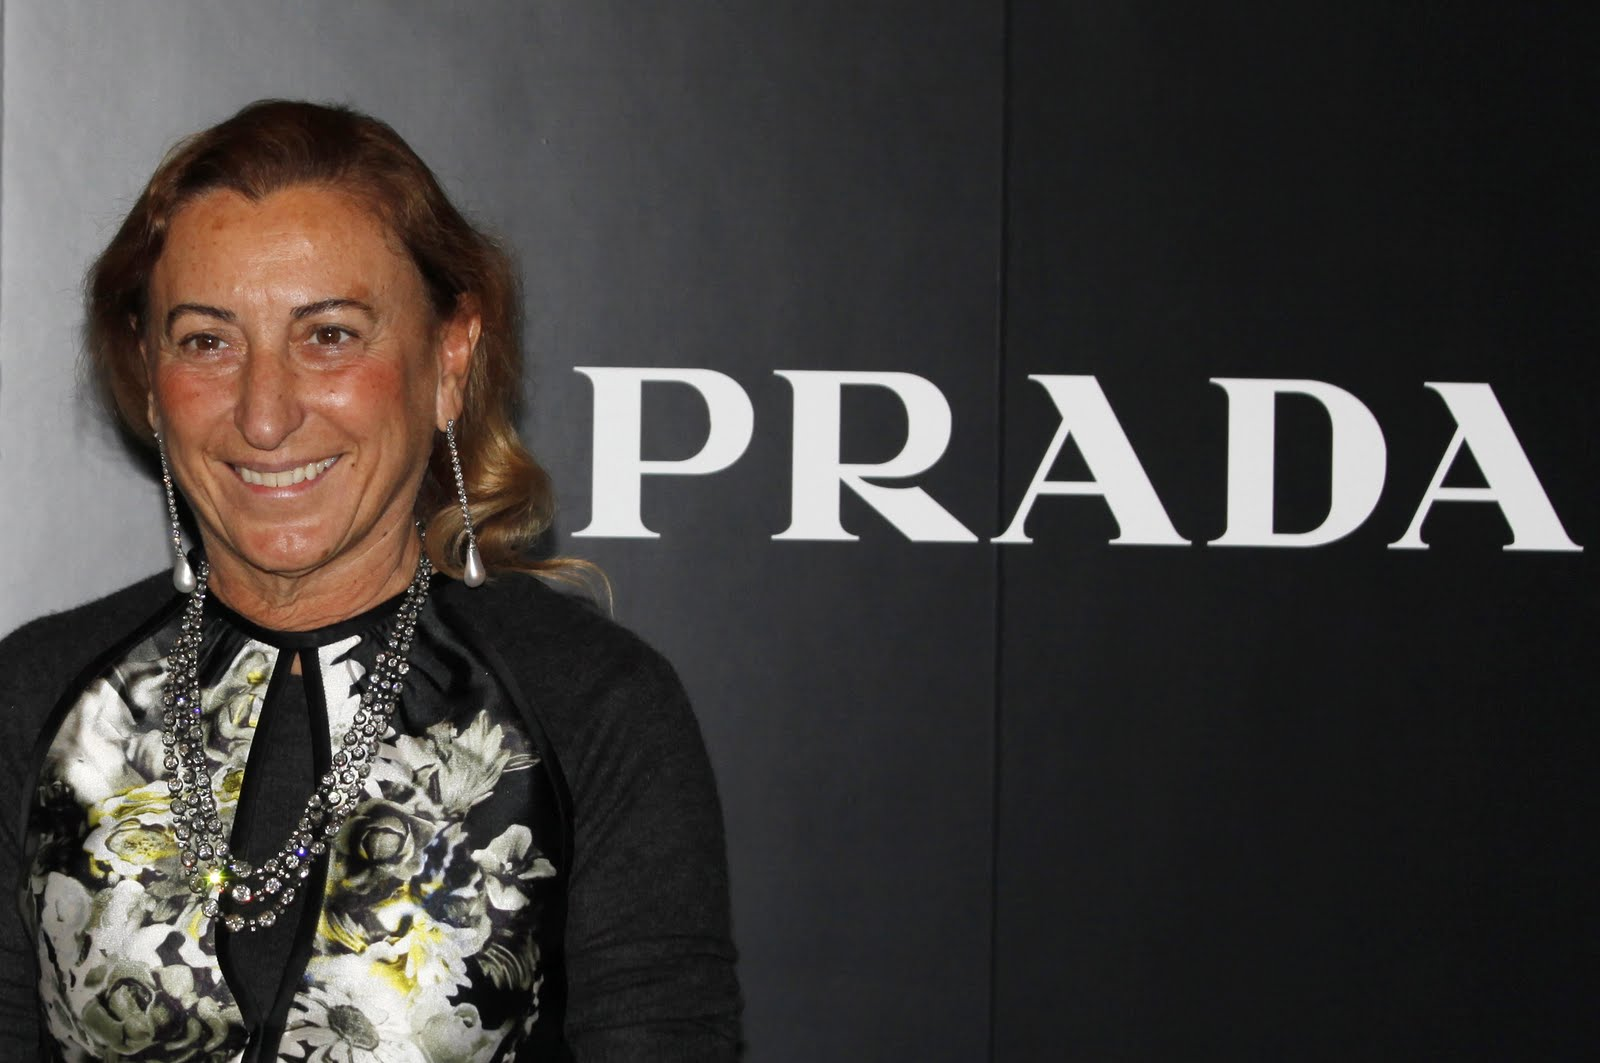 a biography of mario valentino an international designer